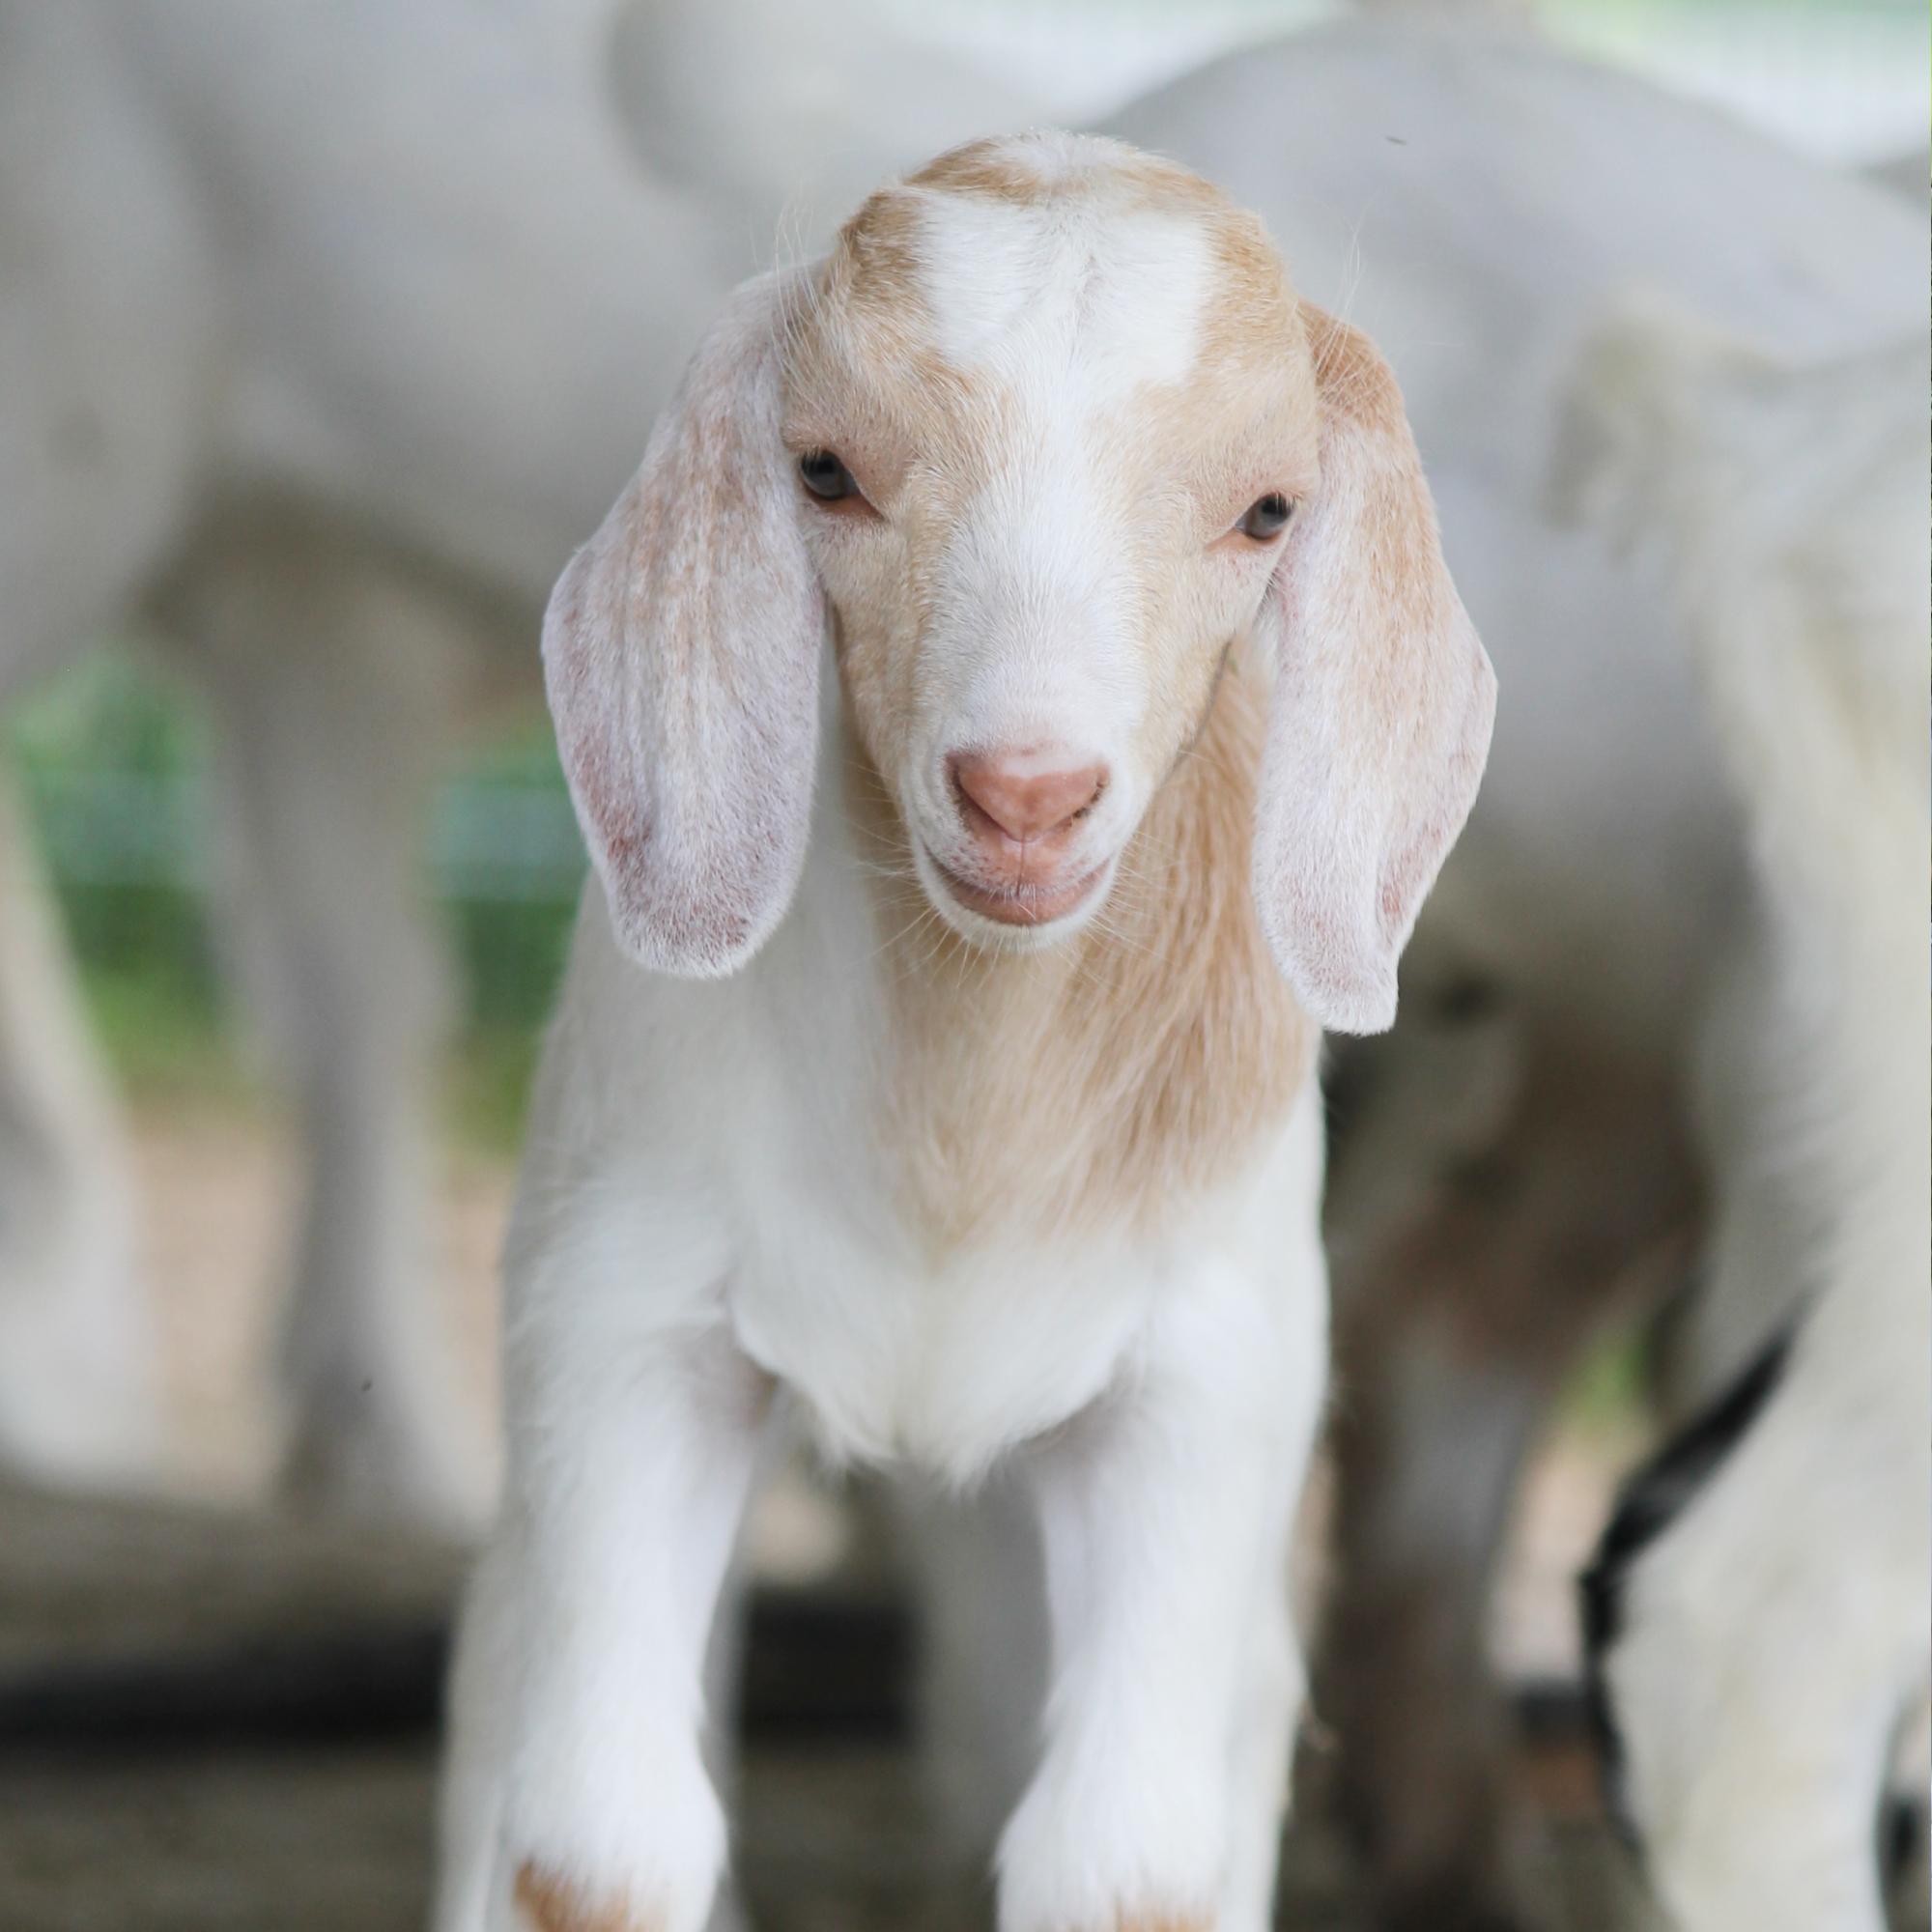 SPCA Operation Baby Goat